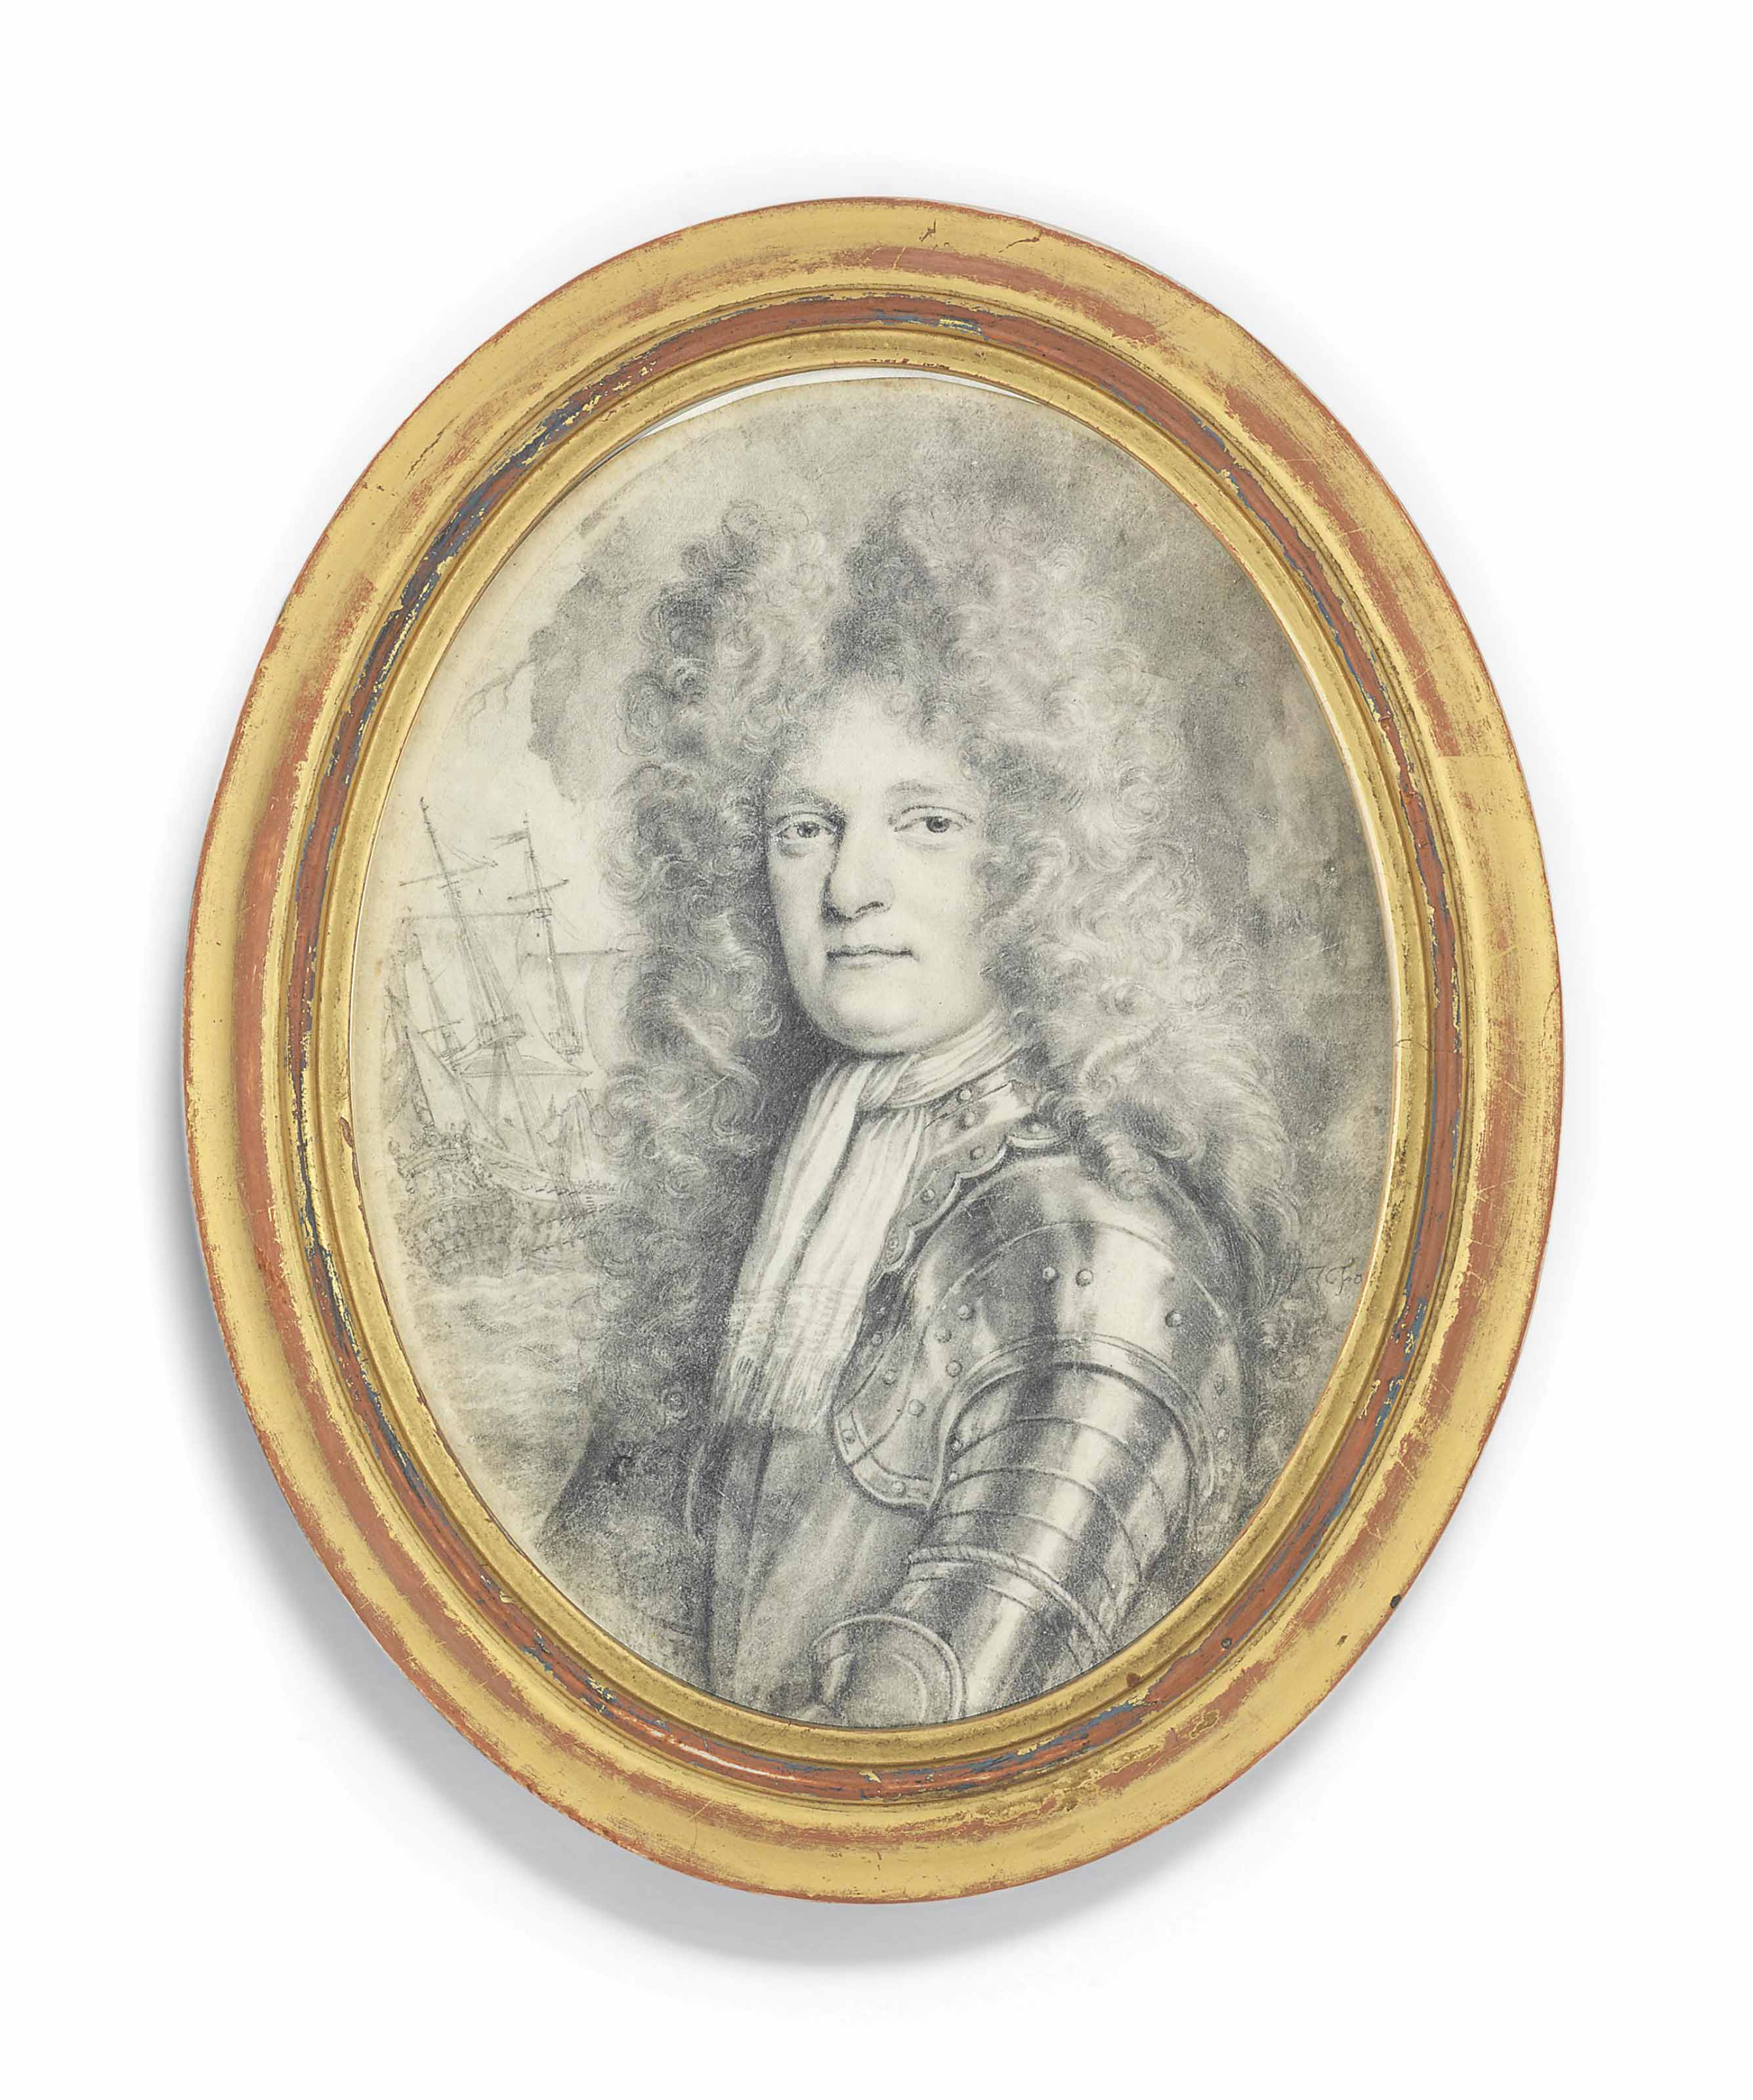 THOMAS FORSTER (BRITISH, 1677-1713)